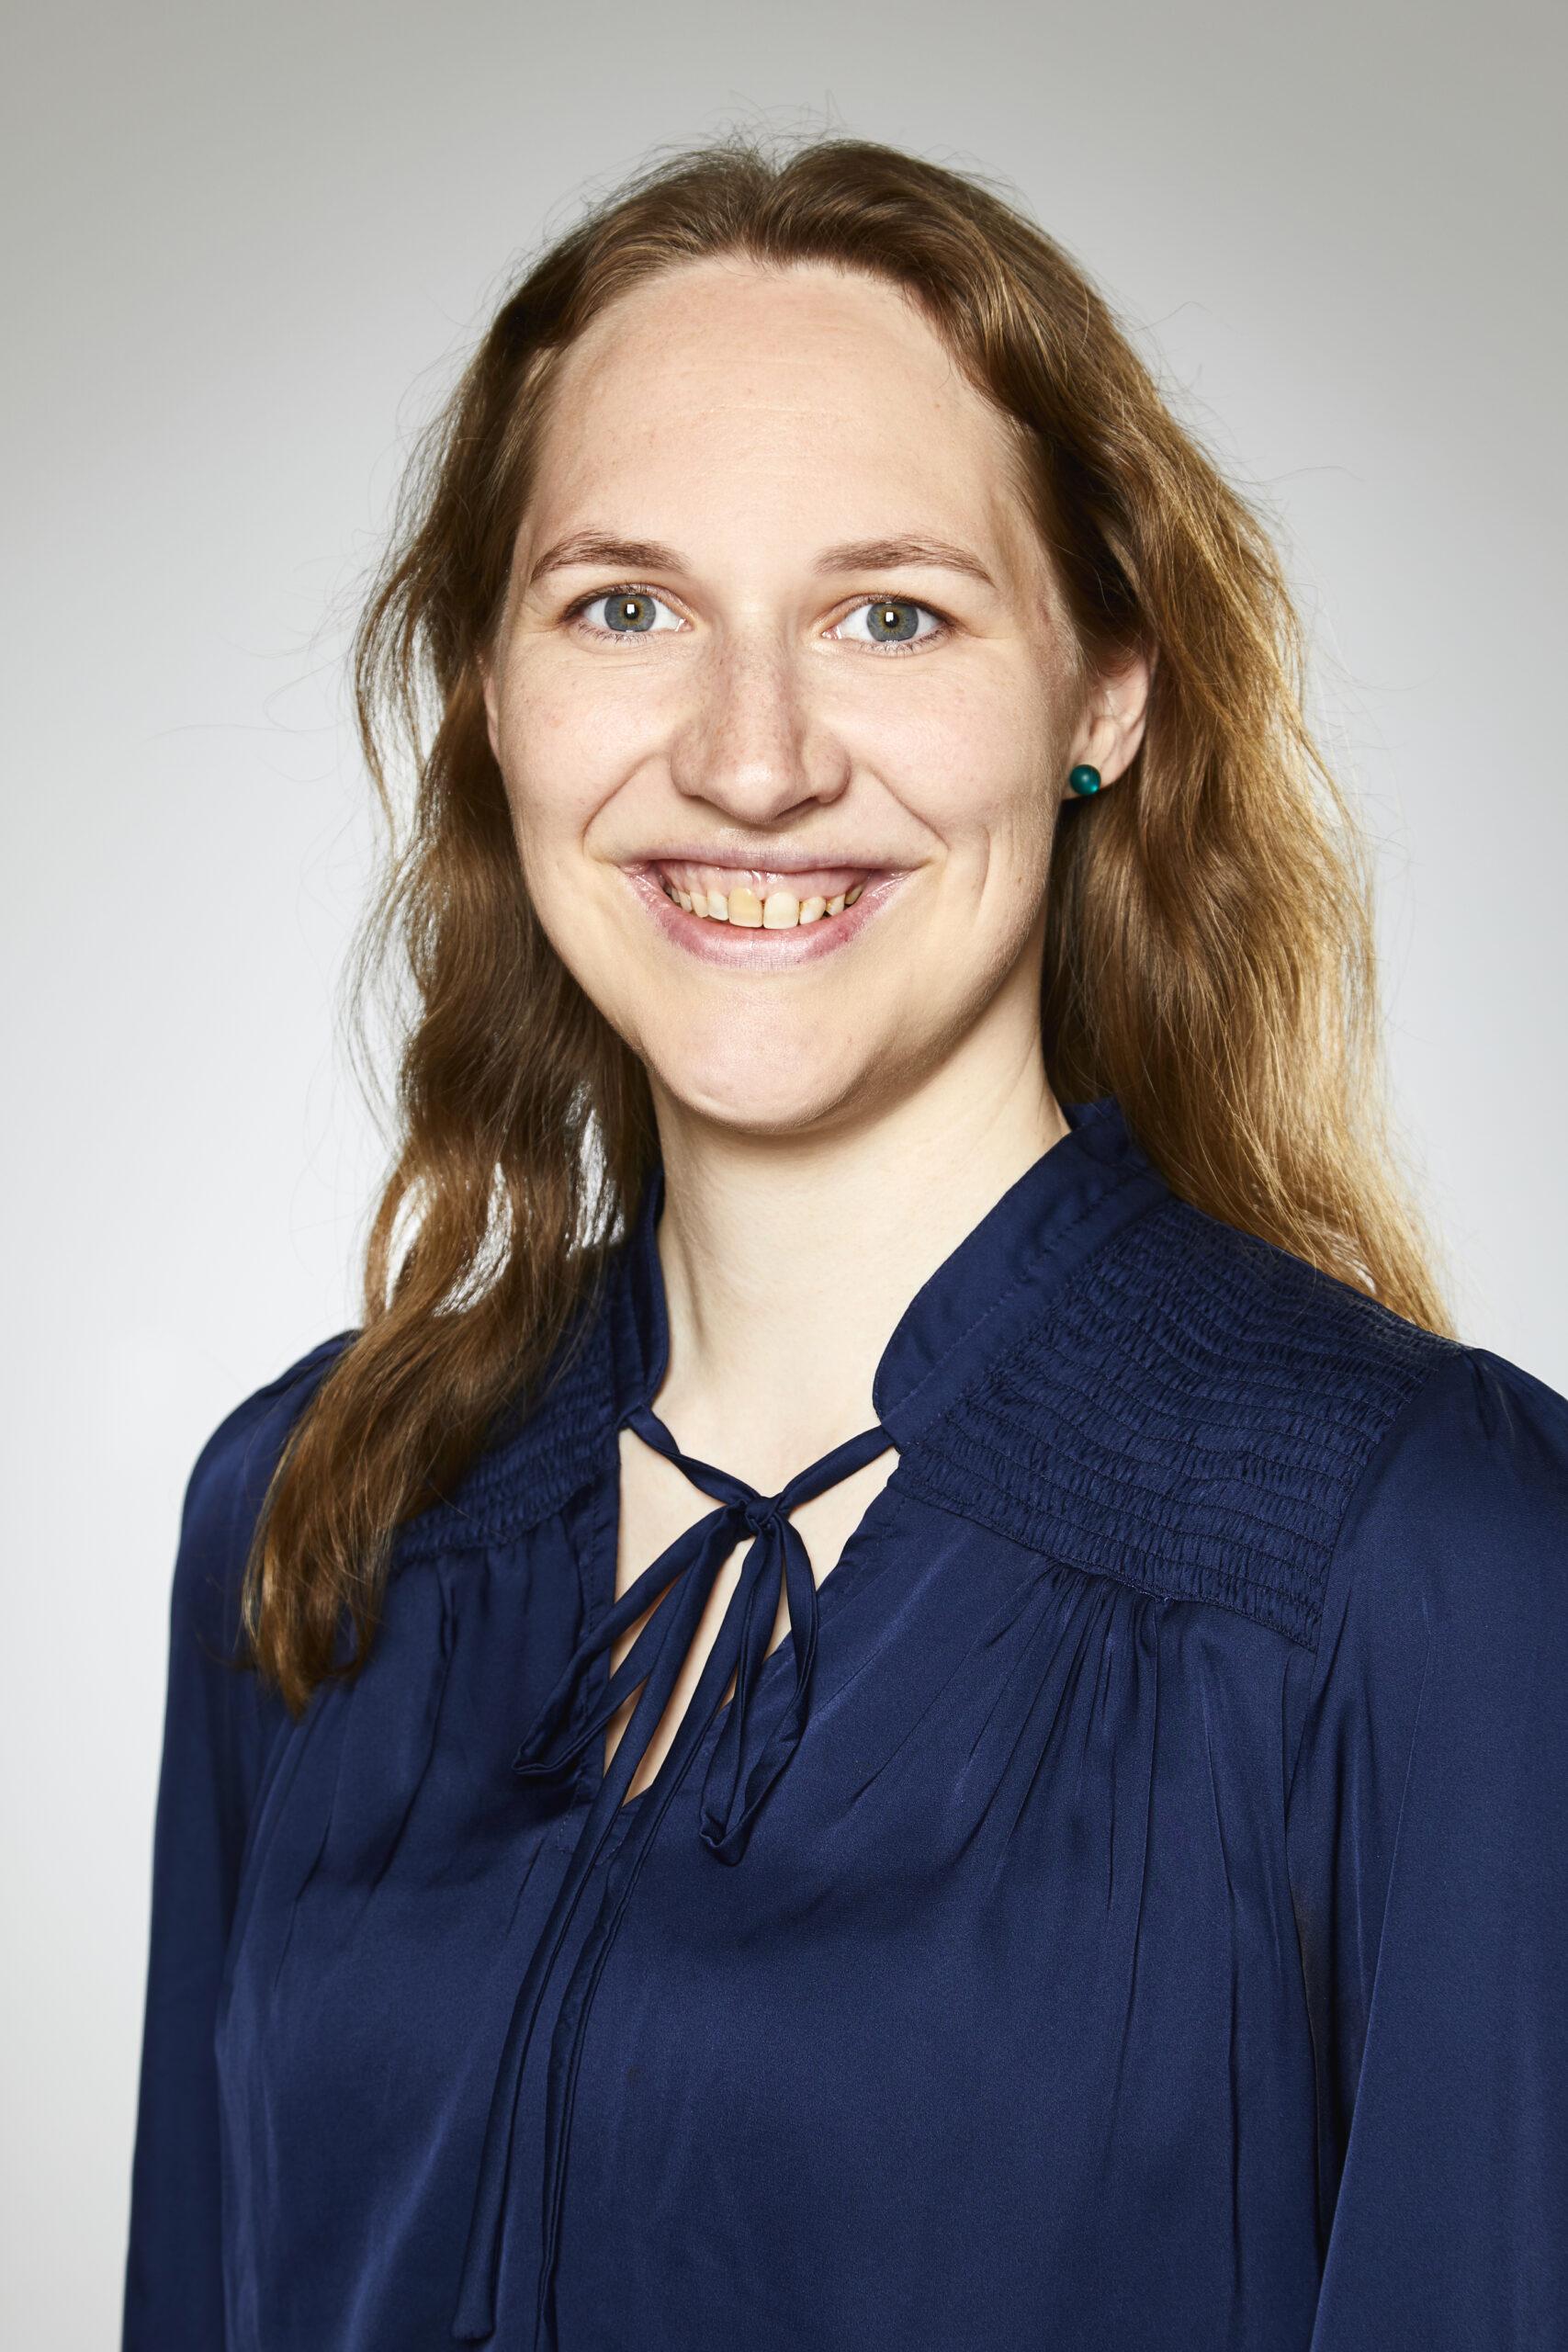 Lisbeth L. B. Prangsgaard